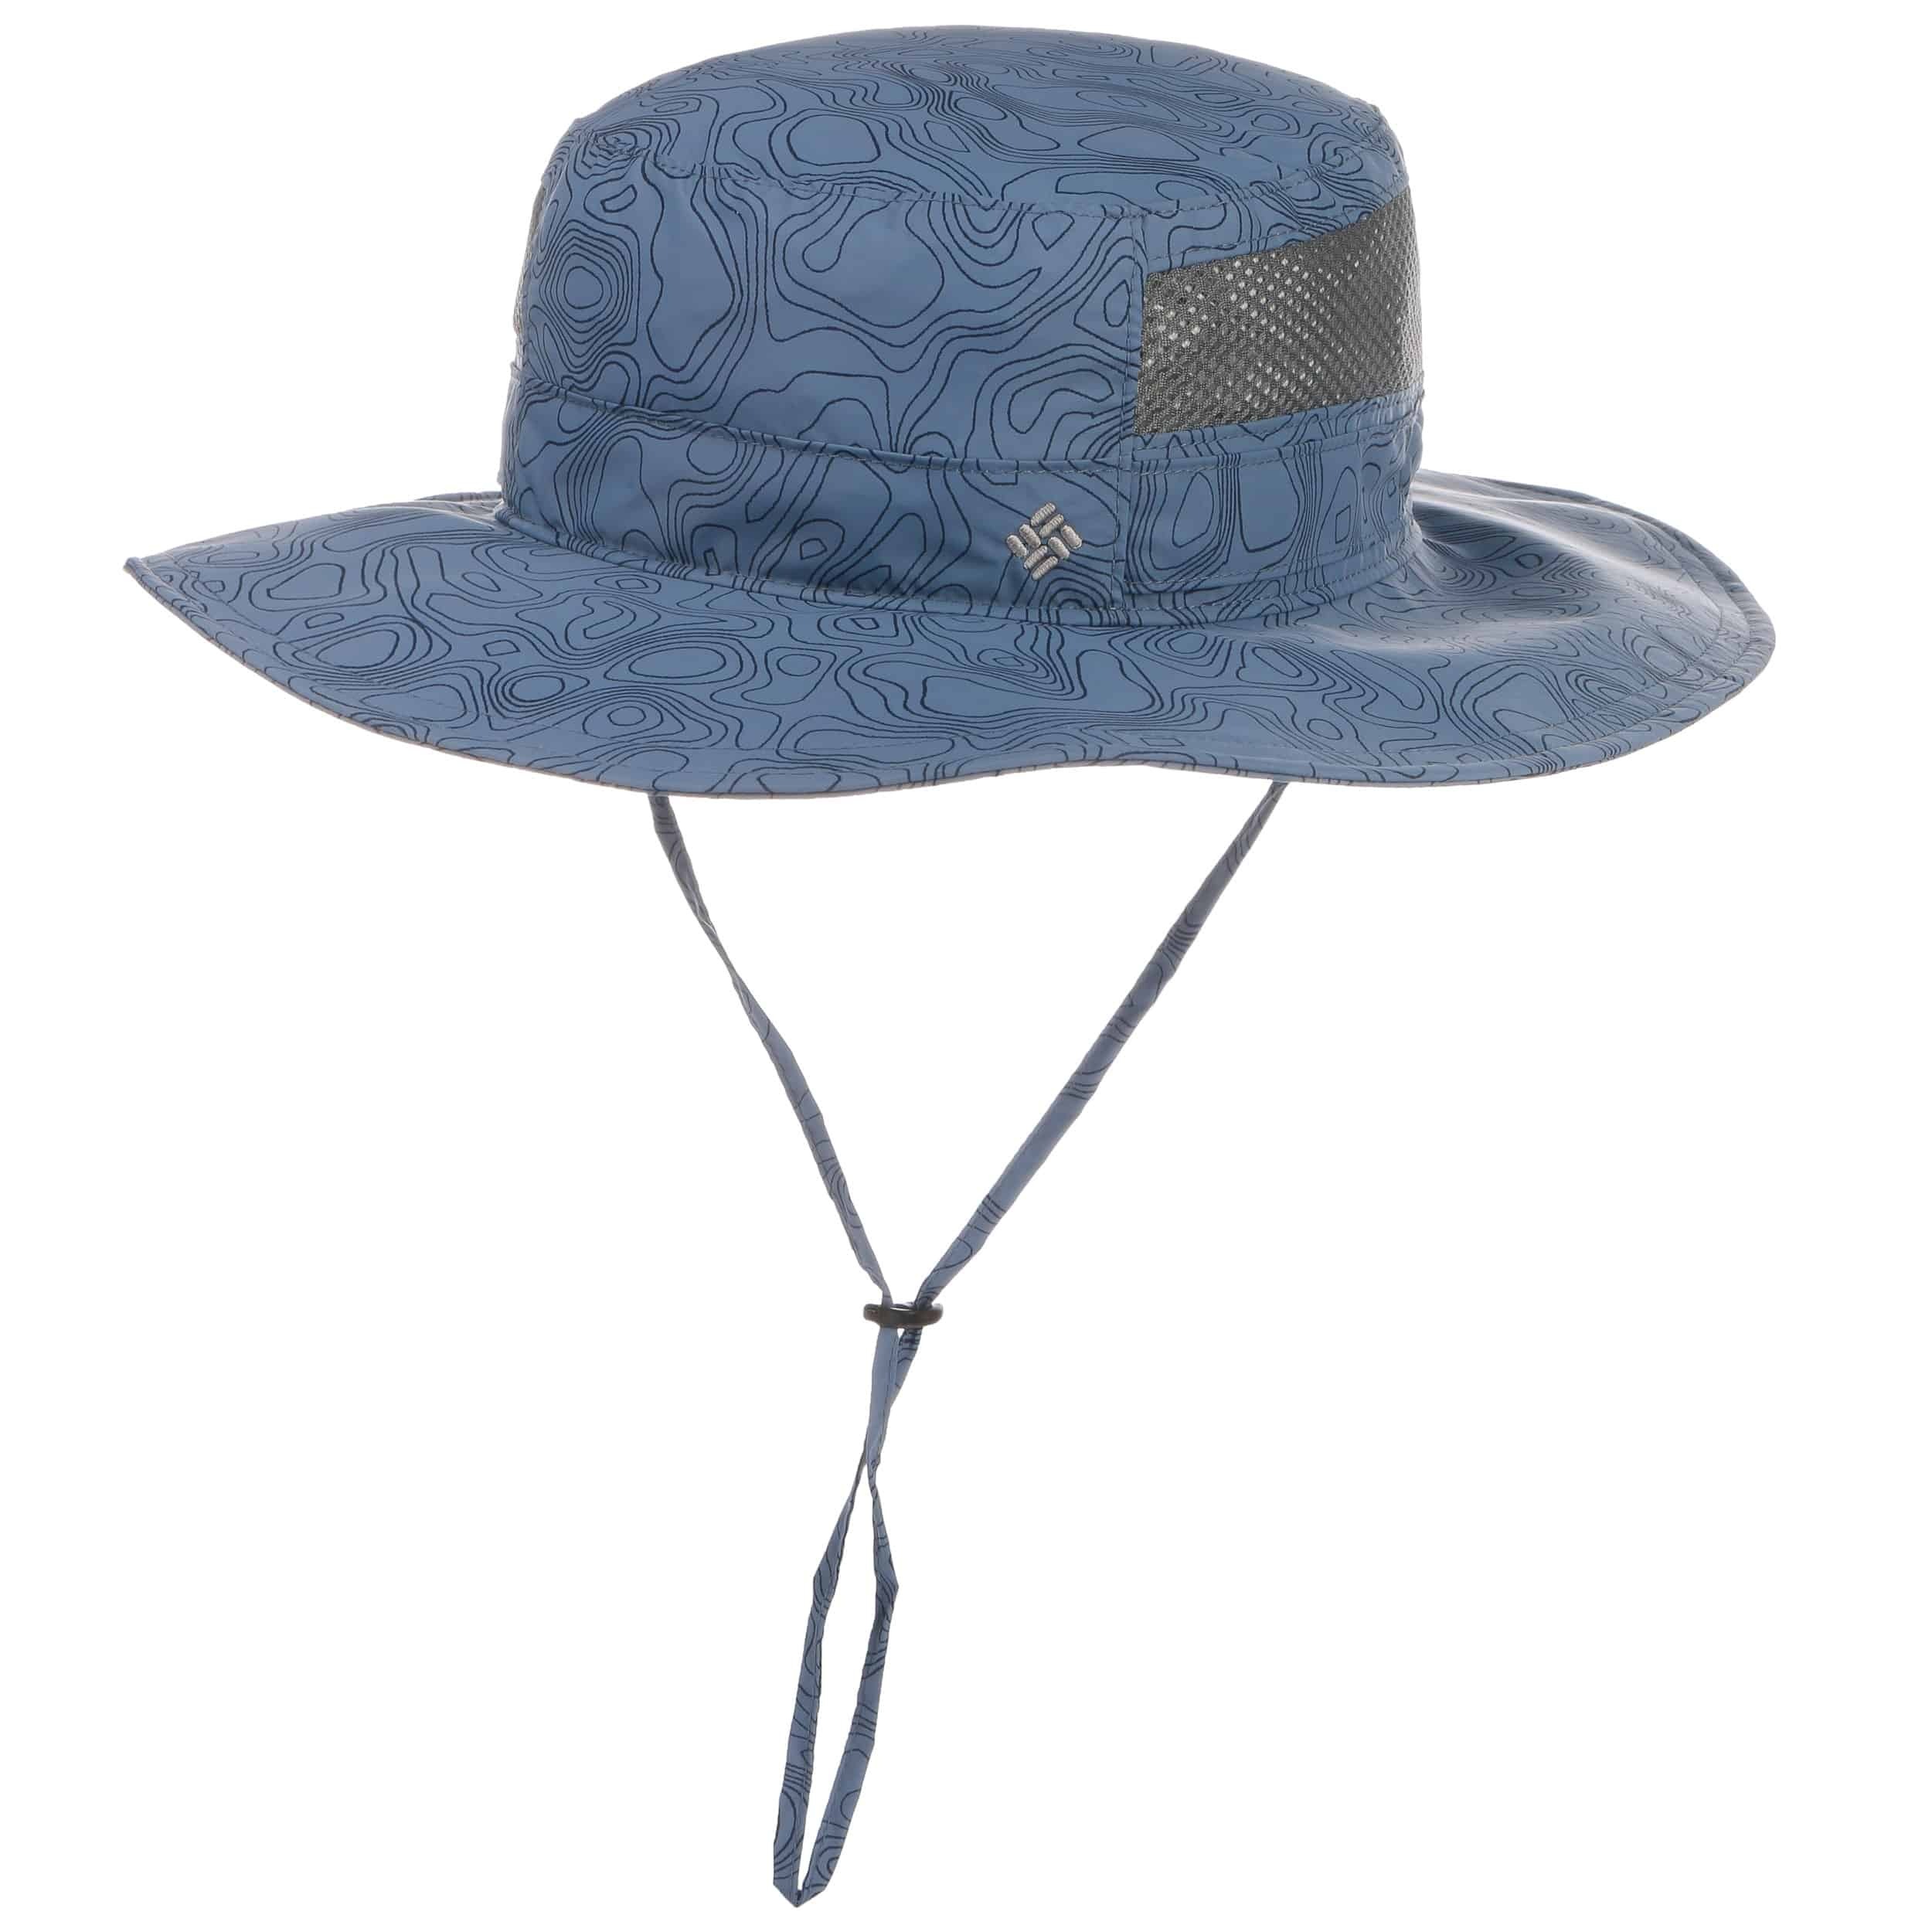 ... Bora Bora Booney Print Fishing Hat by Columbia - blue 6 8b297e145bf